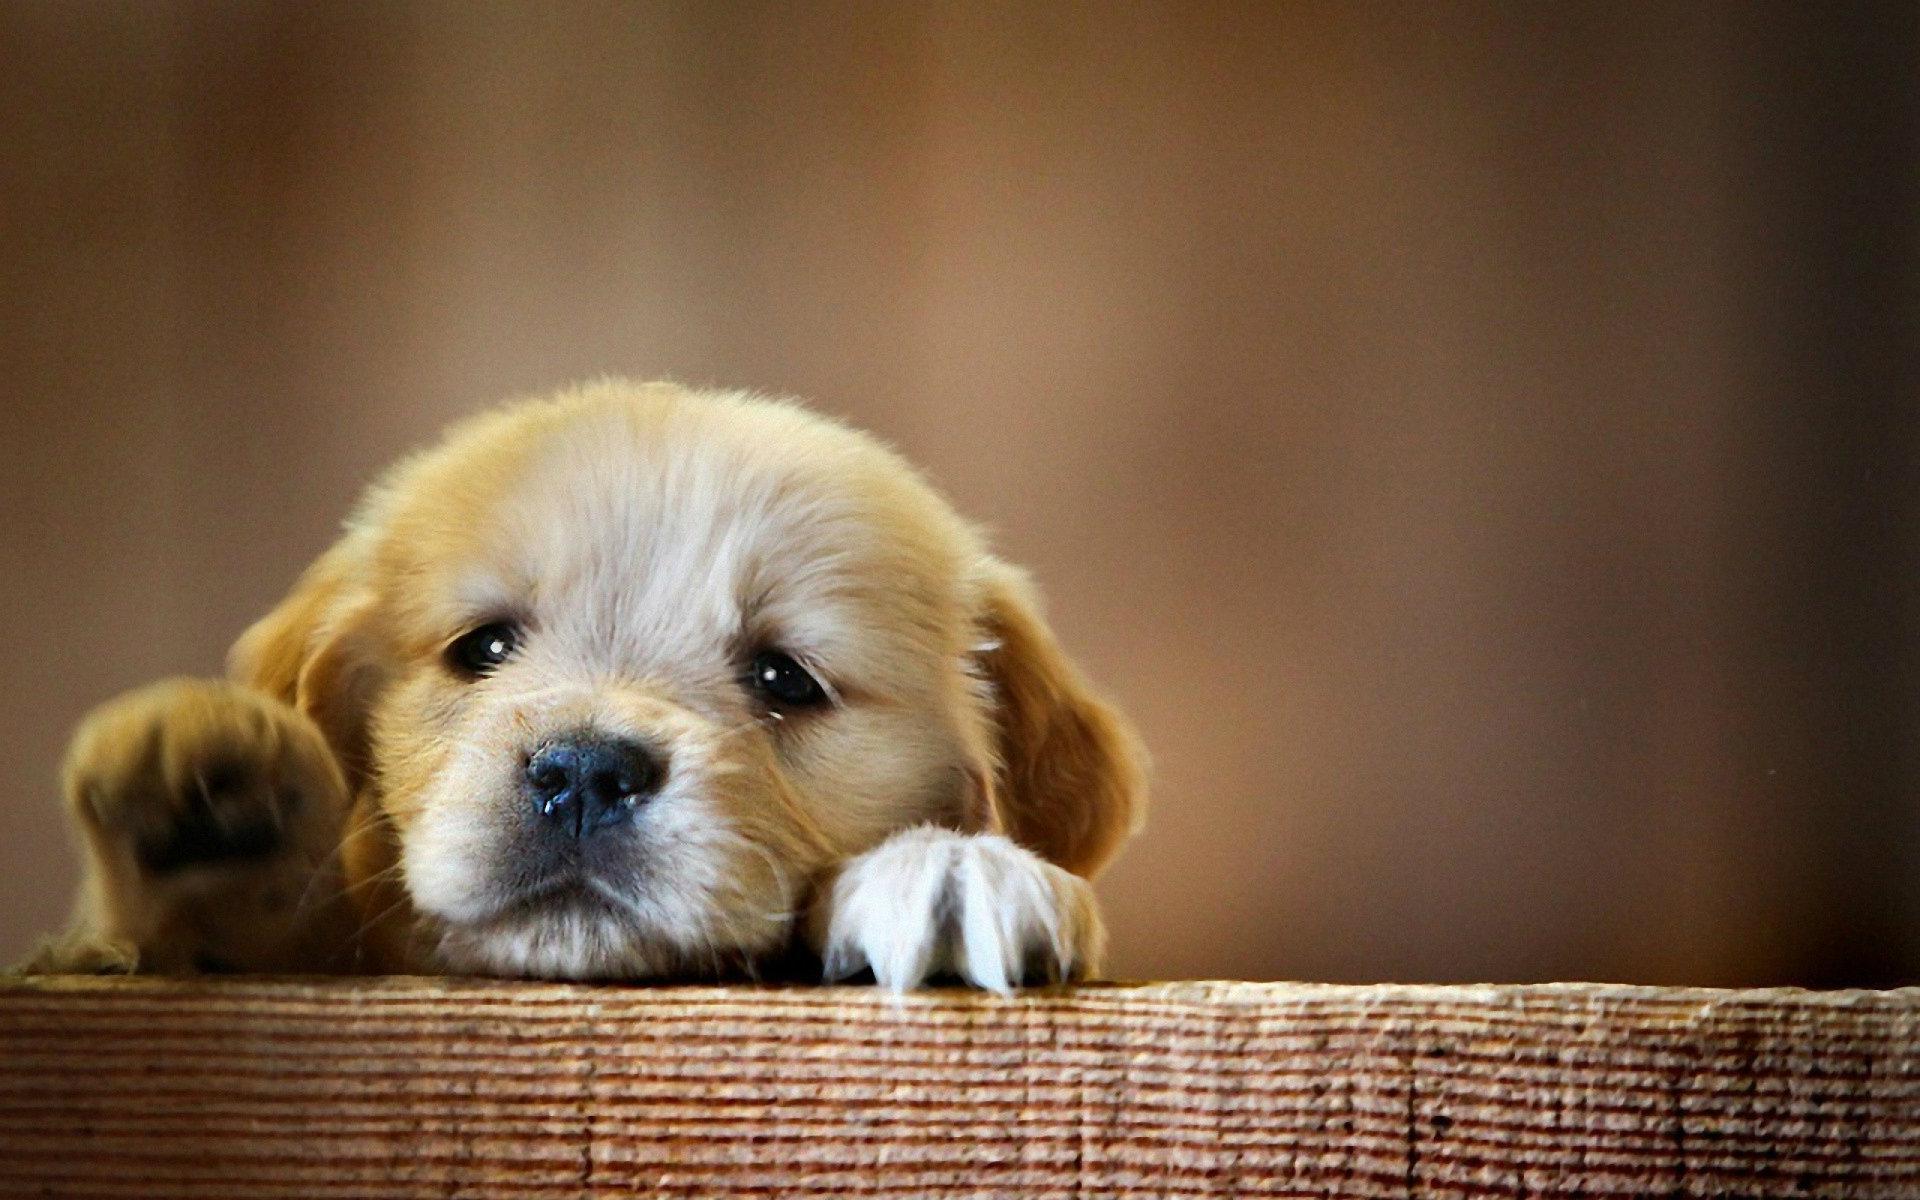 50 Cute Dogs Wallpapers Dog Puppy Desktop Wallpapers 1920x1200